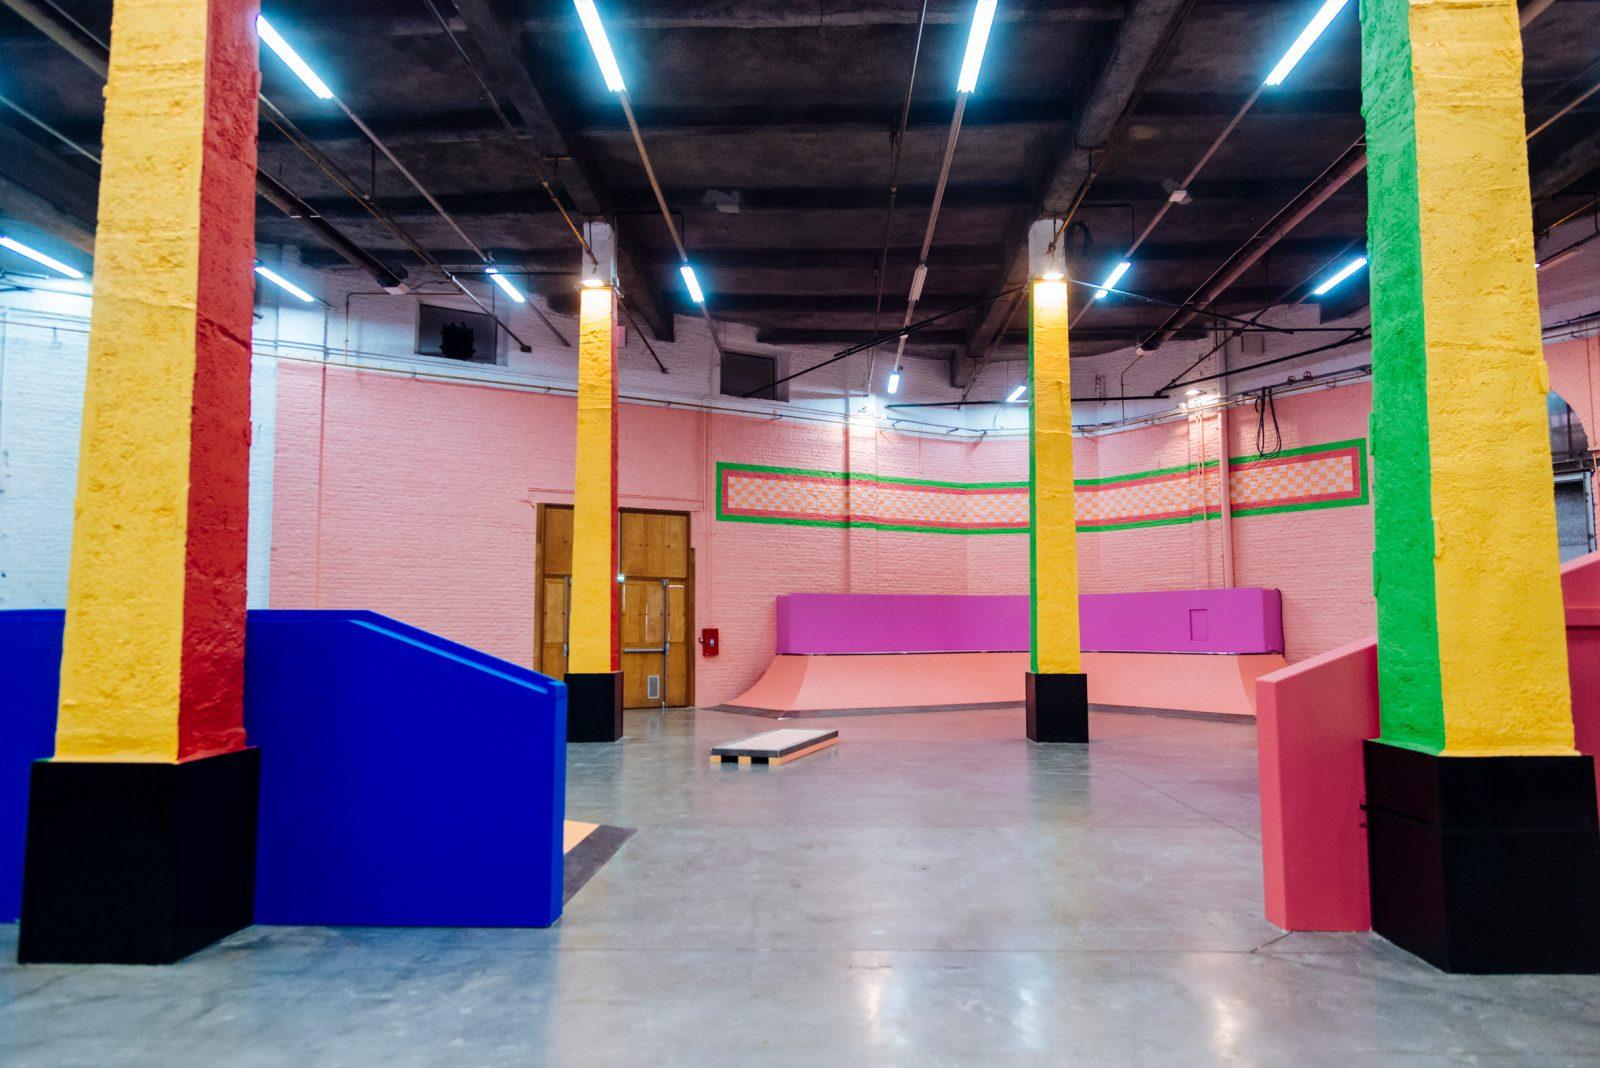 Yinka Ilori Indoor Skatepark in La Condition Publique Lille France